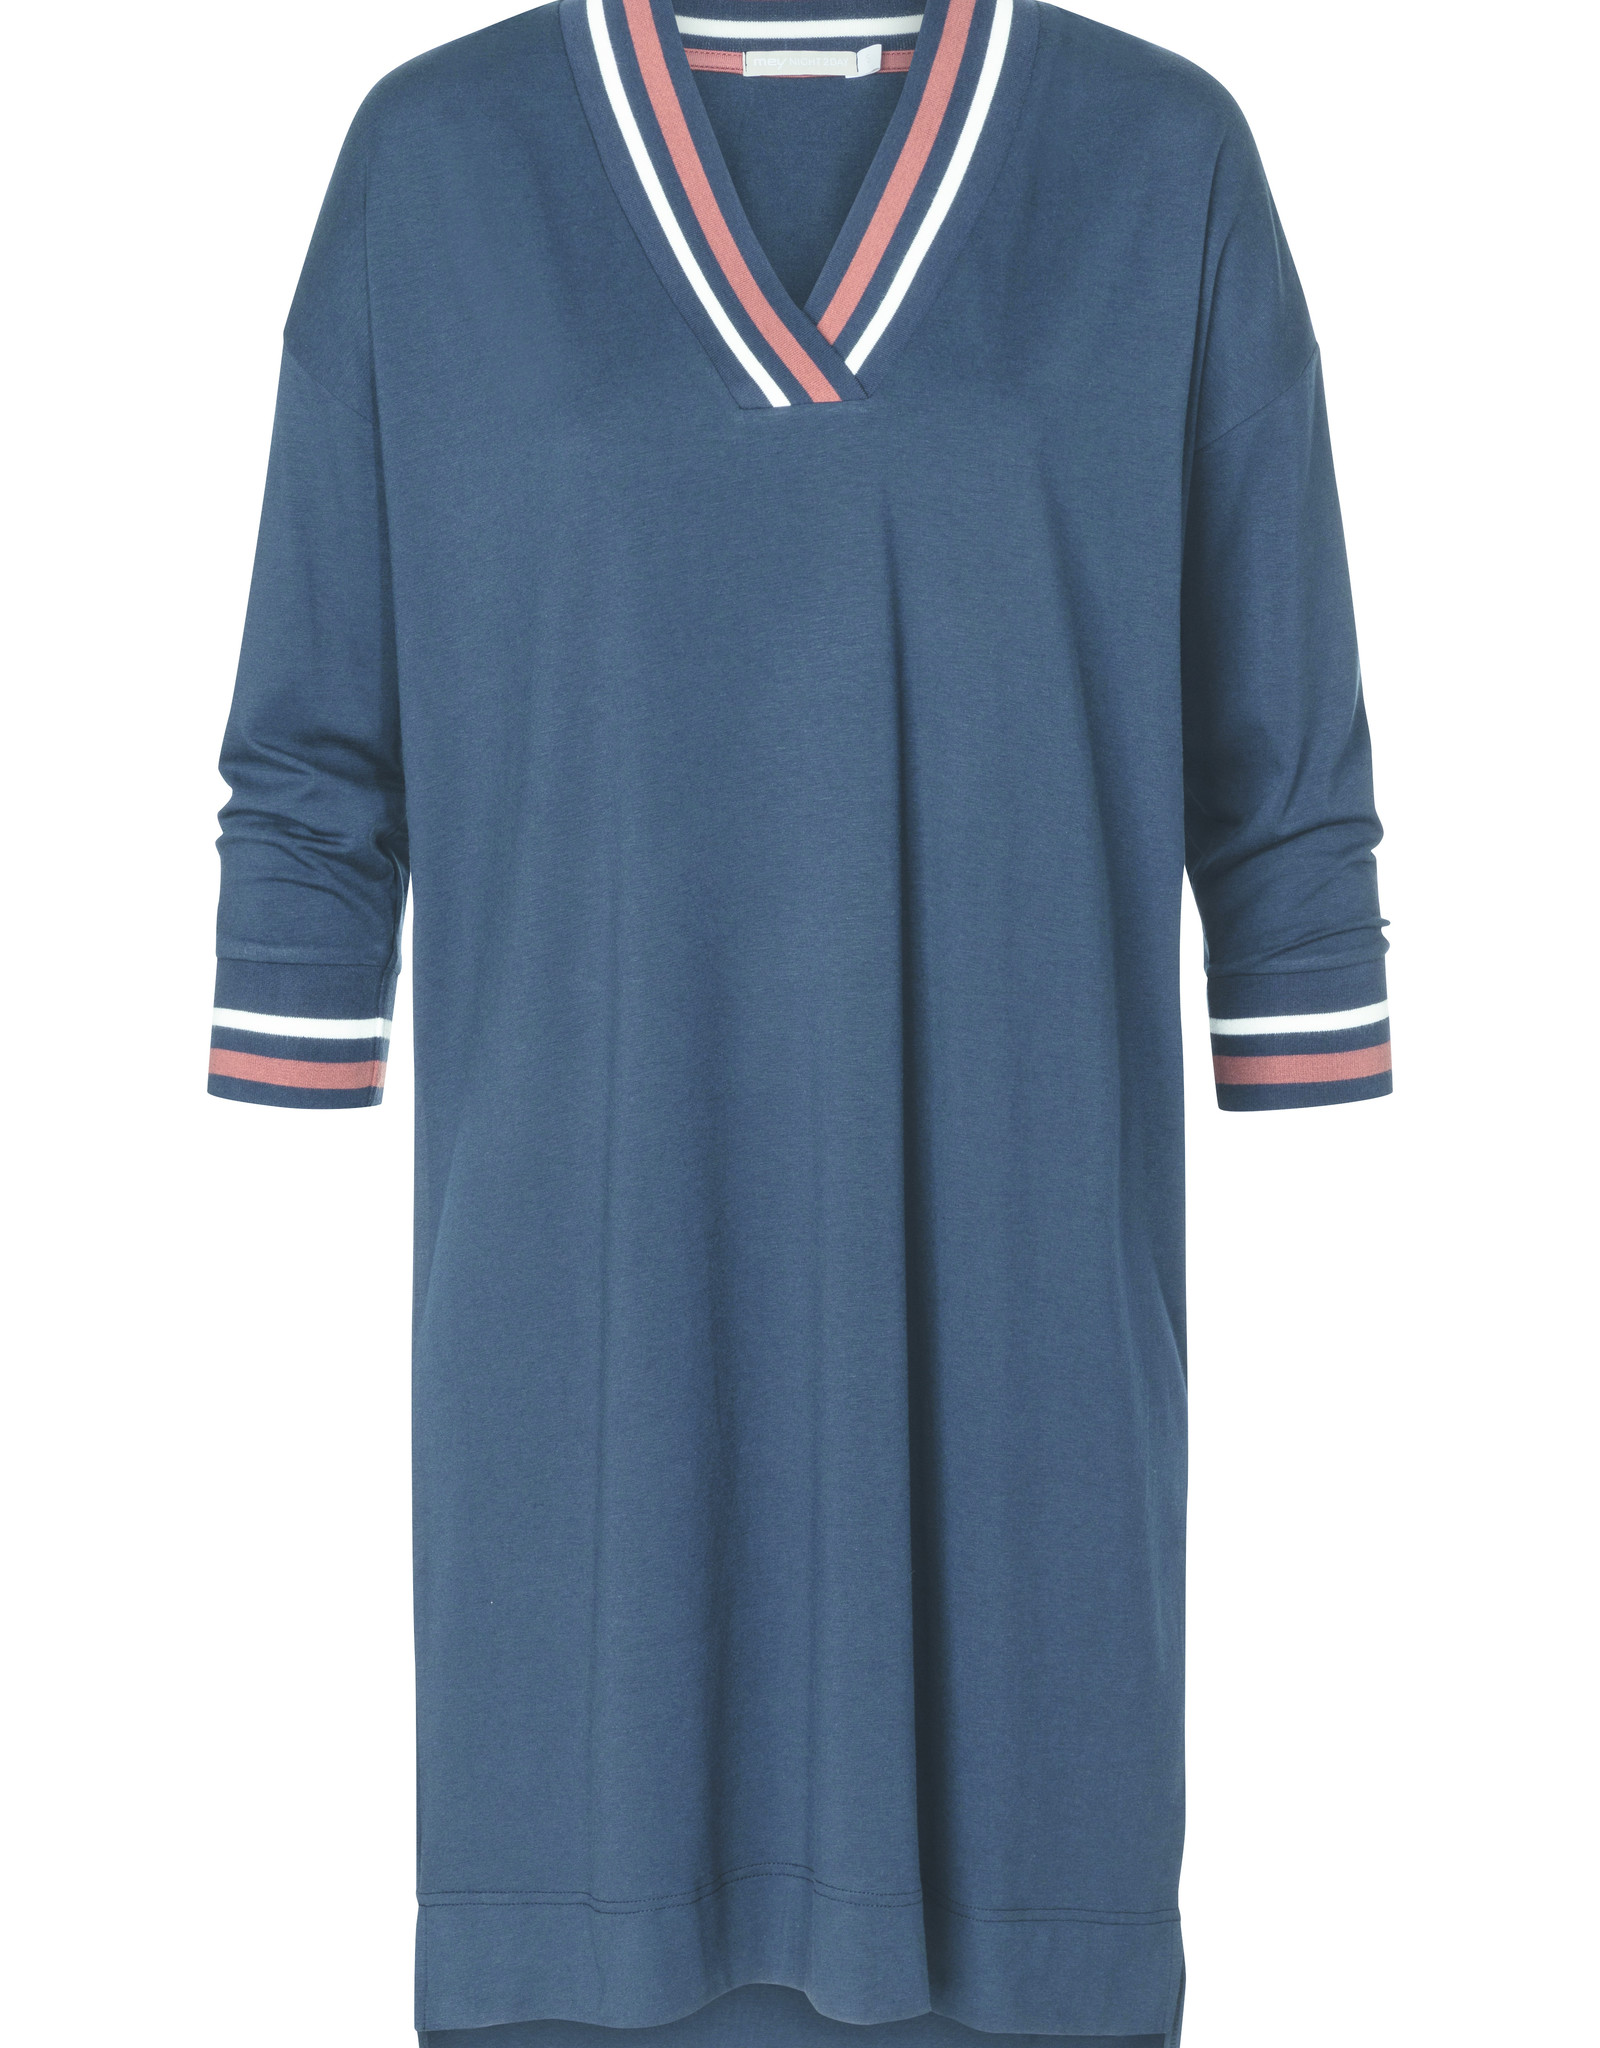 Mey NIGHT2DAY Nadja Bigshirt 3/4 sleeve